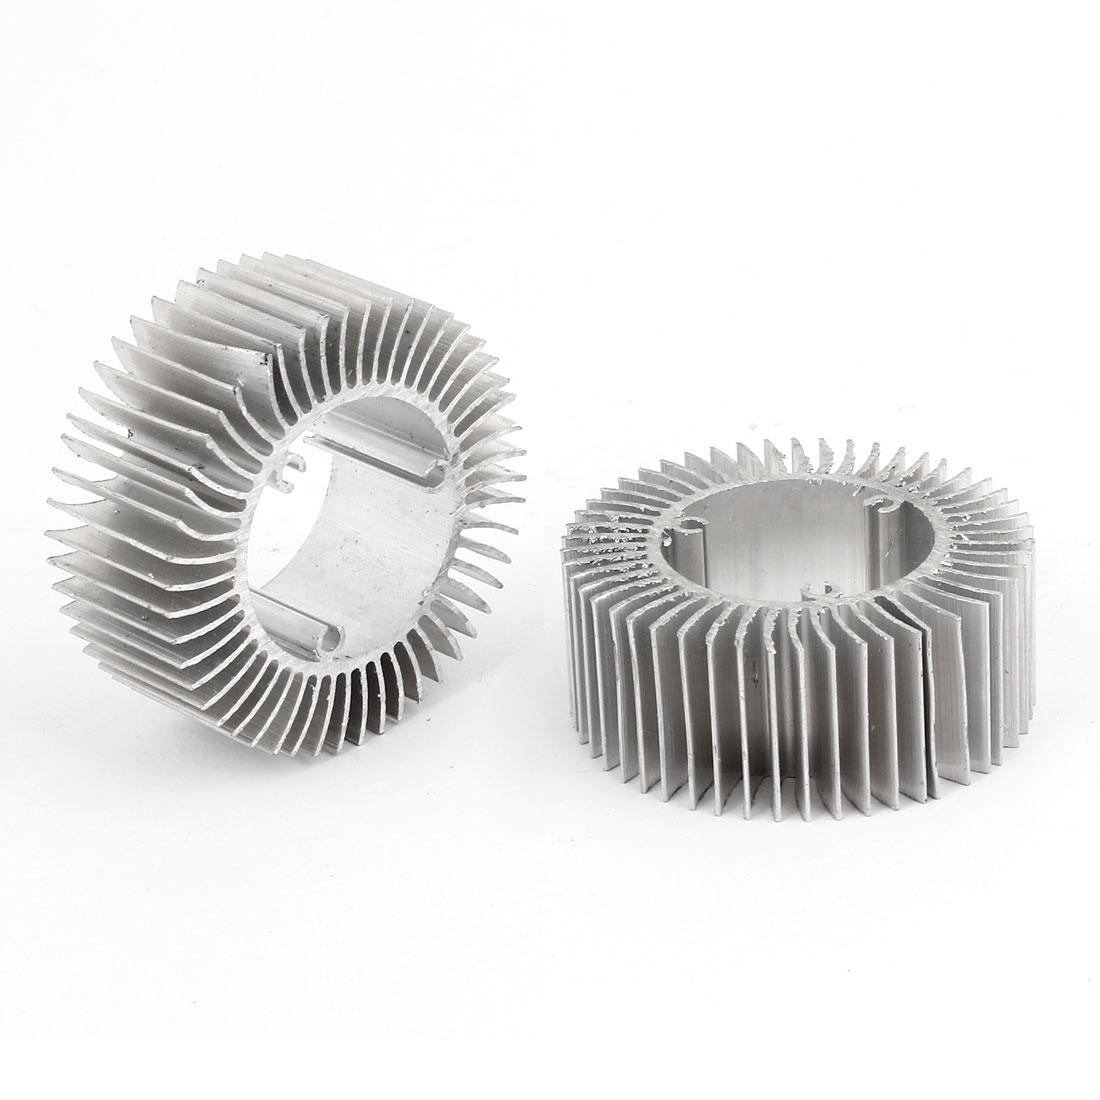 Led Light Lamp Aluminum Heatsink Radiator Cooling Fin 50mmx28.5mmx20mm 2 Pieces